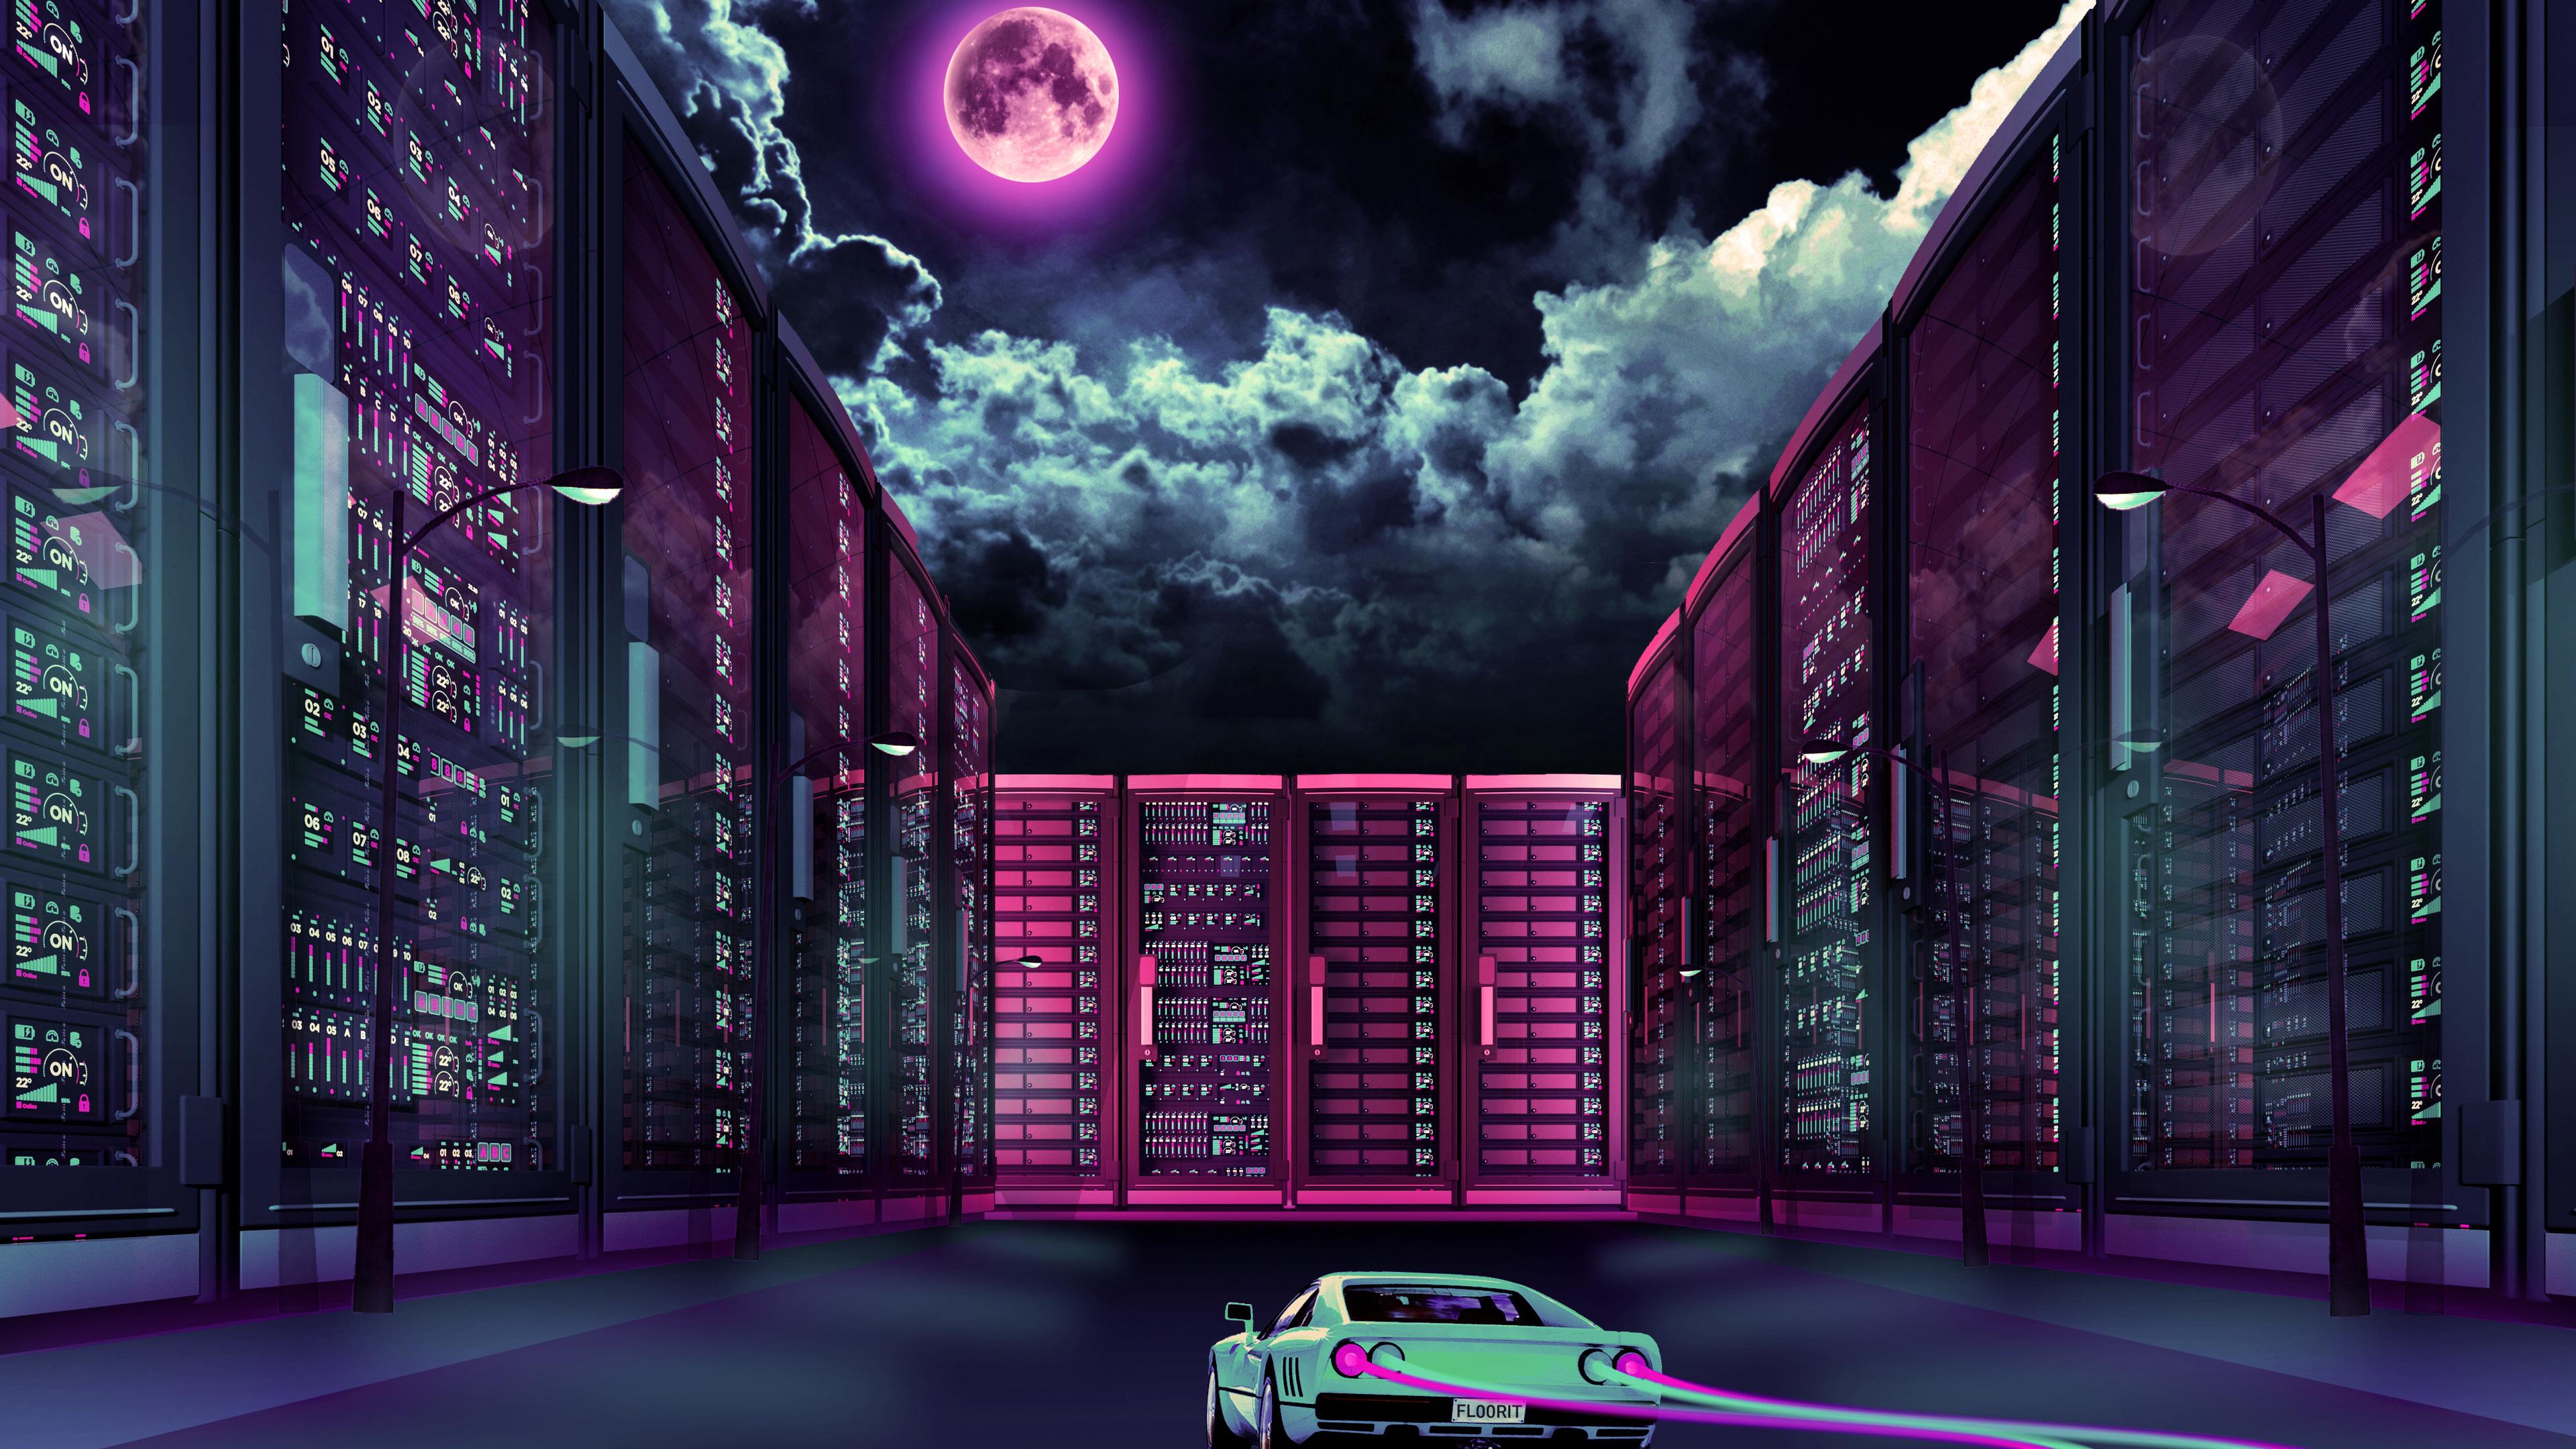 Wallpaper 4k Retrowave Car Going Through City Moon 4k wallpapers 3840x2160